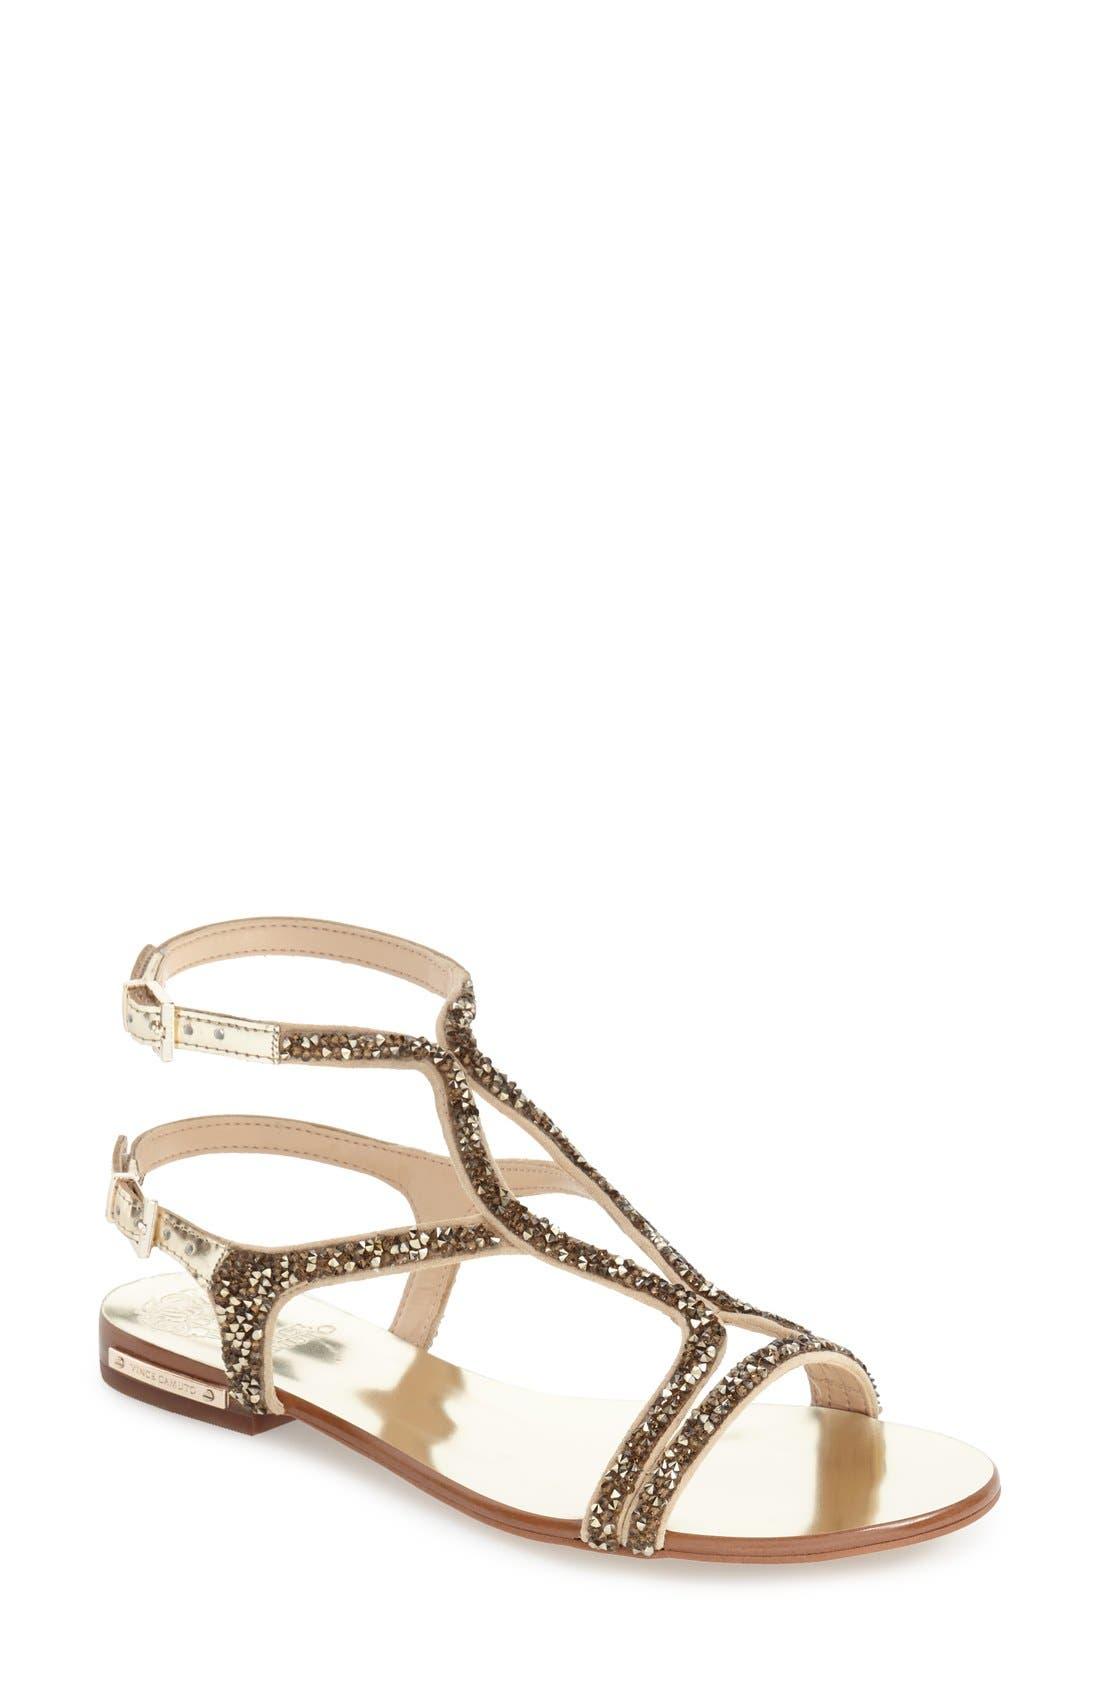 Main Image - Vince Camuto 'Jacinta' Ankle Strap Sandal (Women)